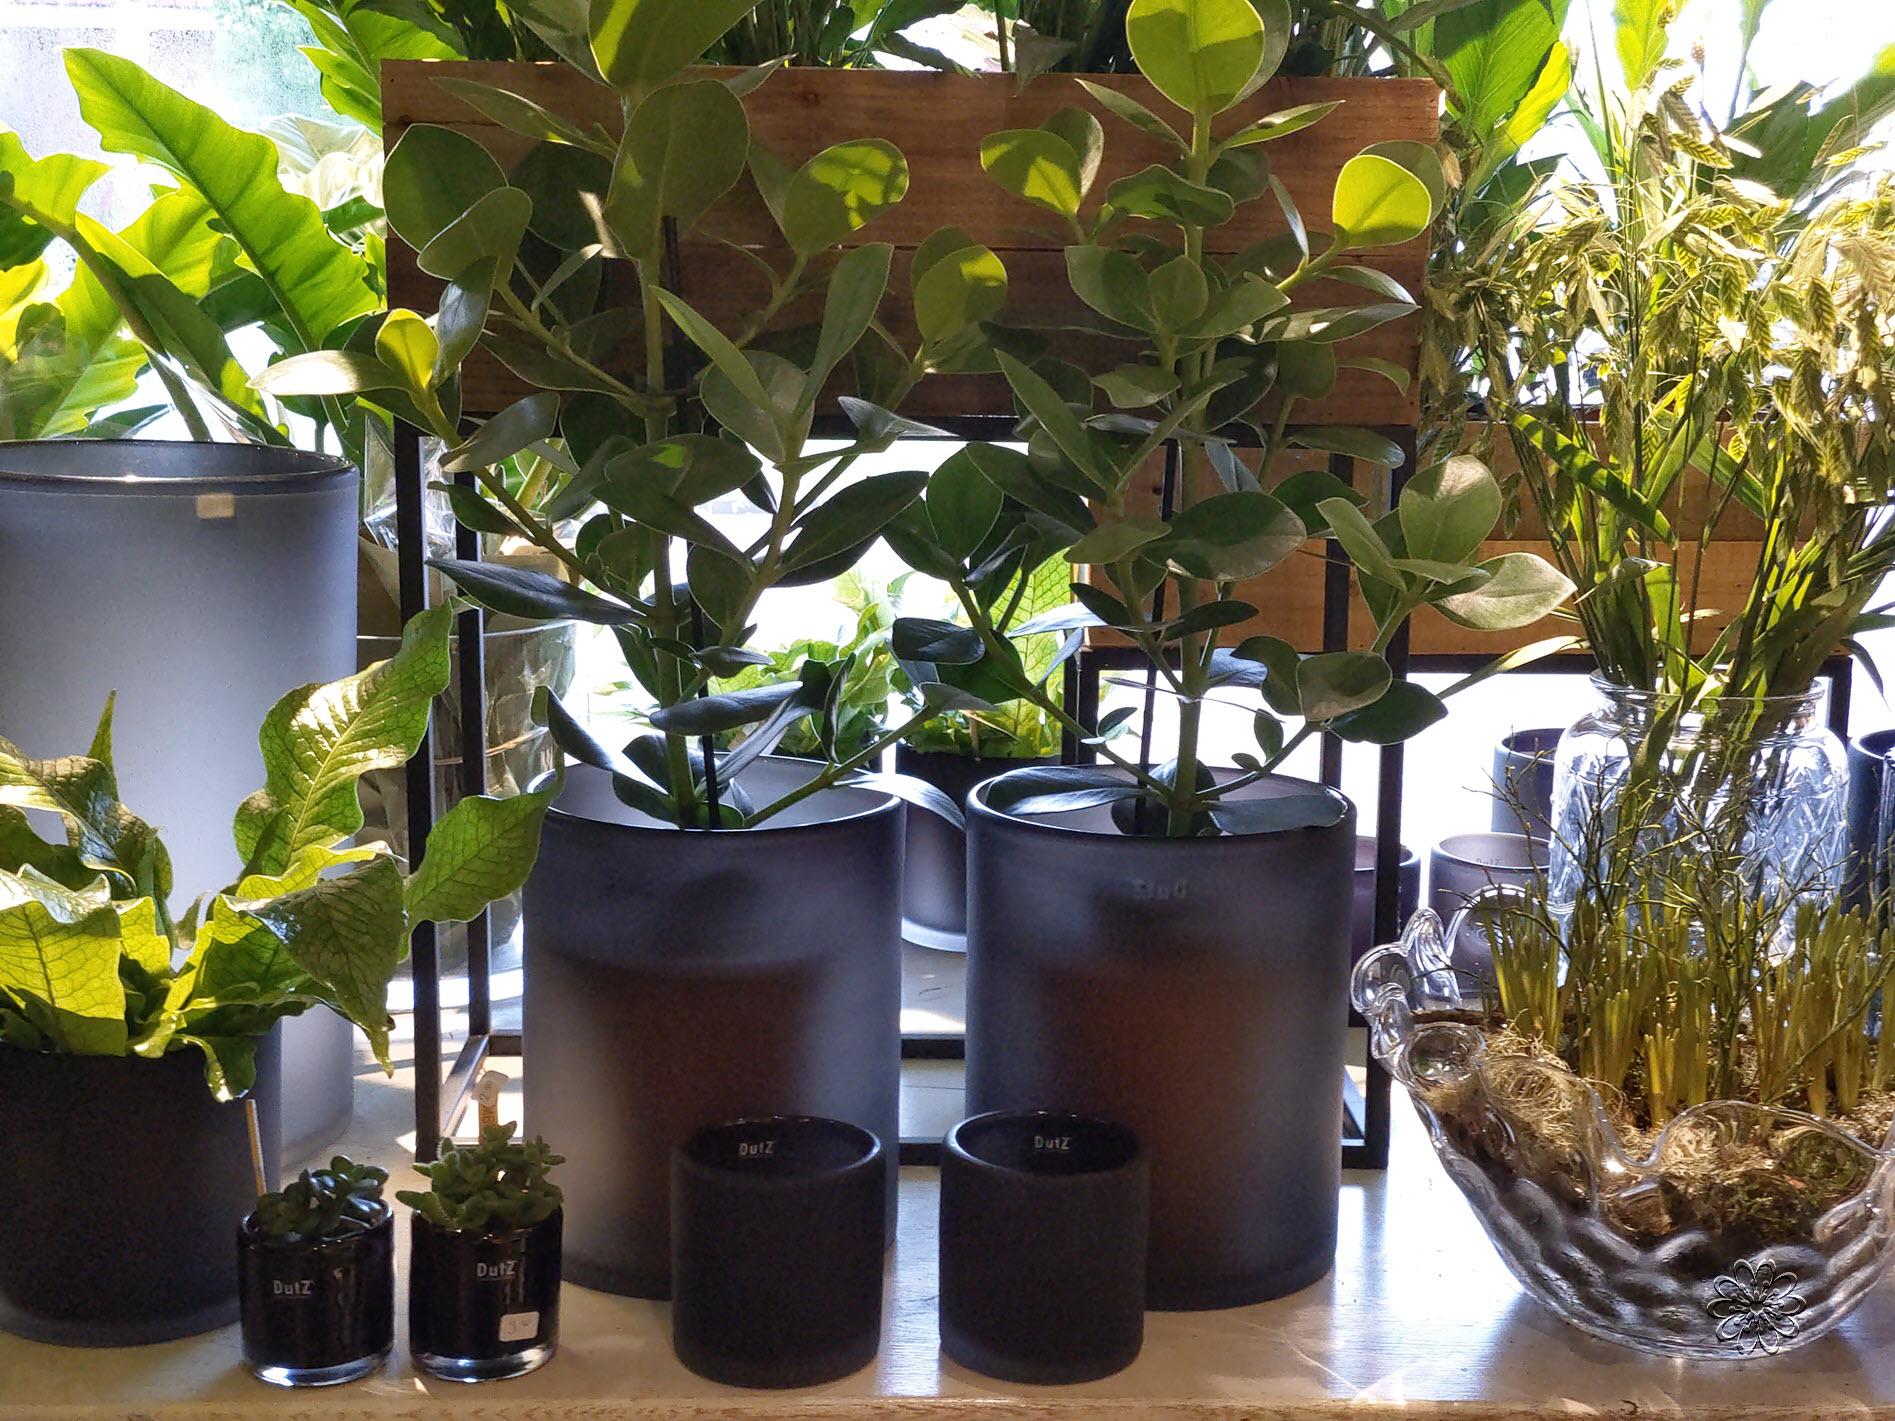 Bloemsierkunst-Groeneveld-kamerplanten-bollen-05